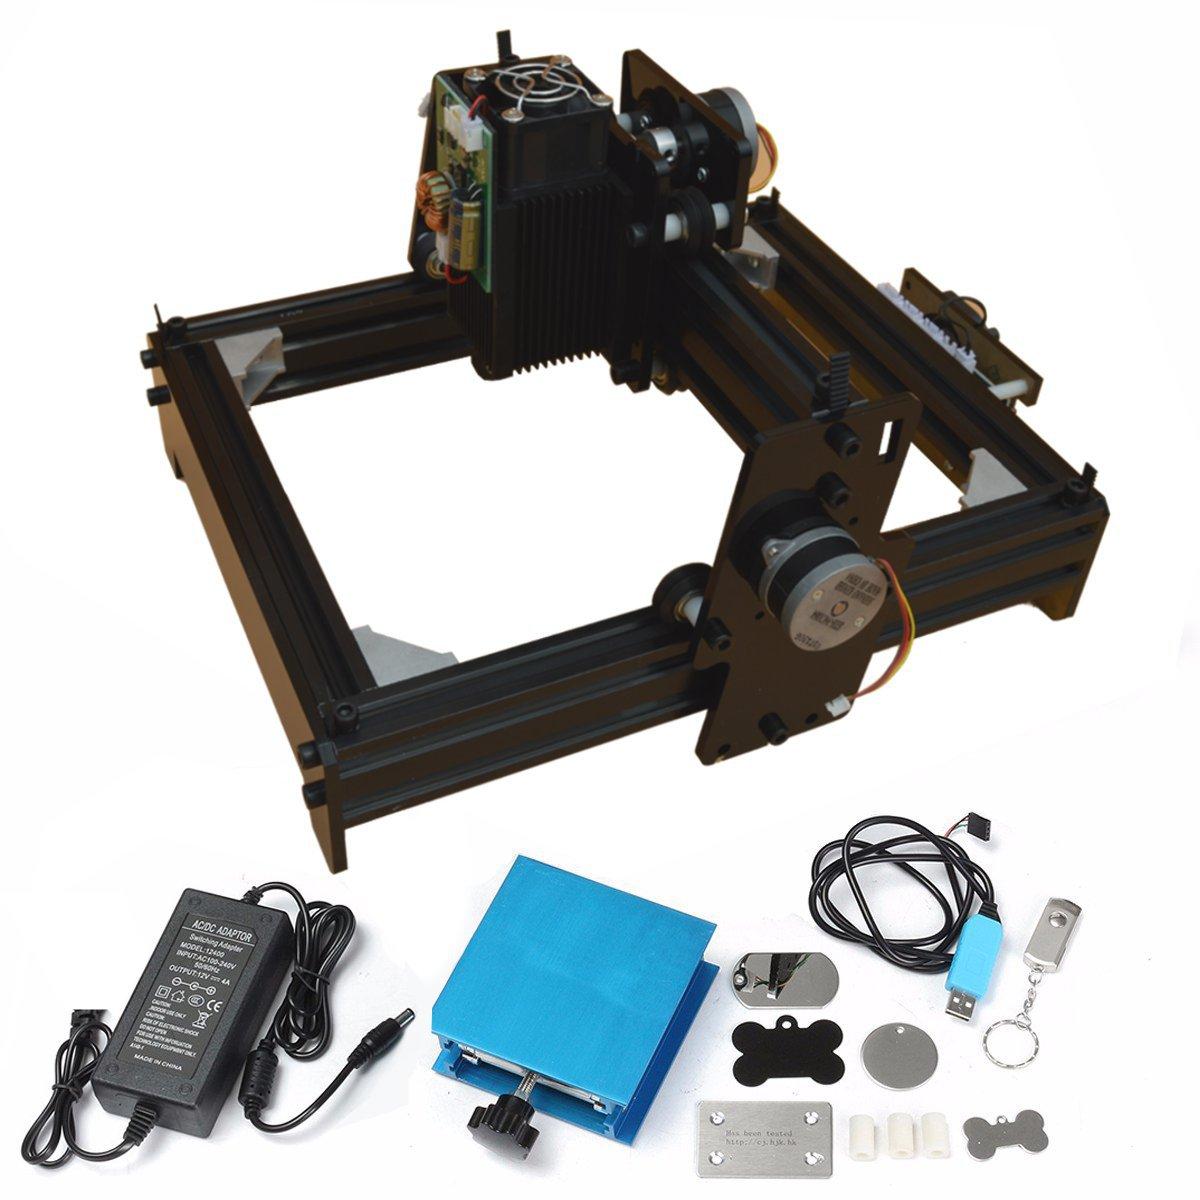 15W CNC Crouter CNC Laser cutter DIY Mini CNC Laser Engraving Machine Wood Router Metal Marking Engraving 2018 Best Advanced Toy